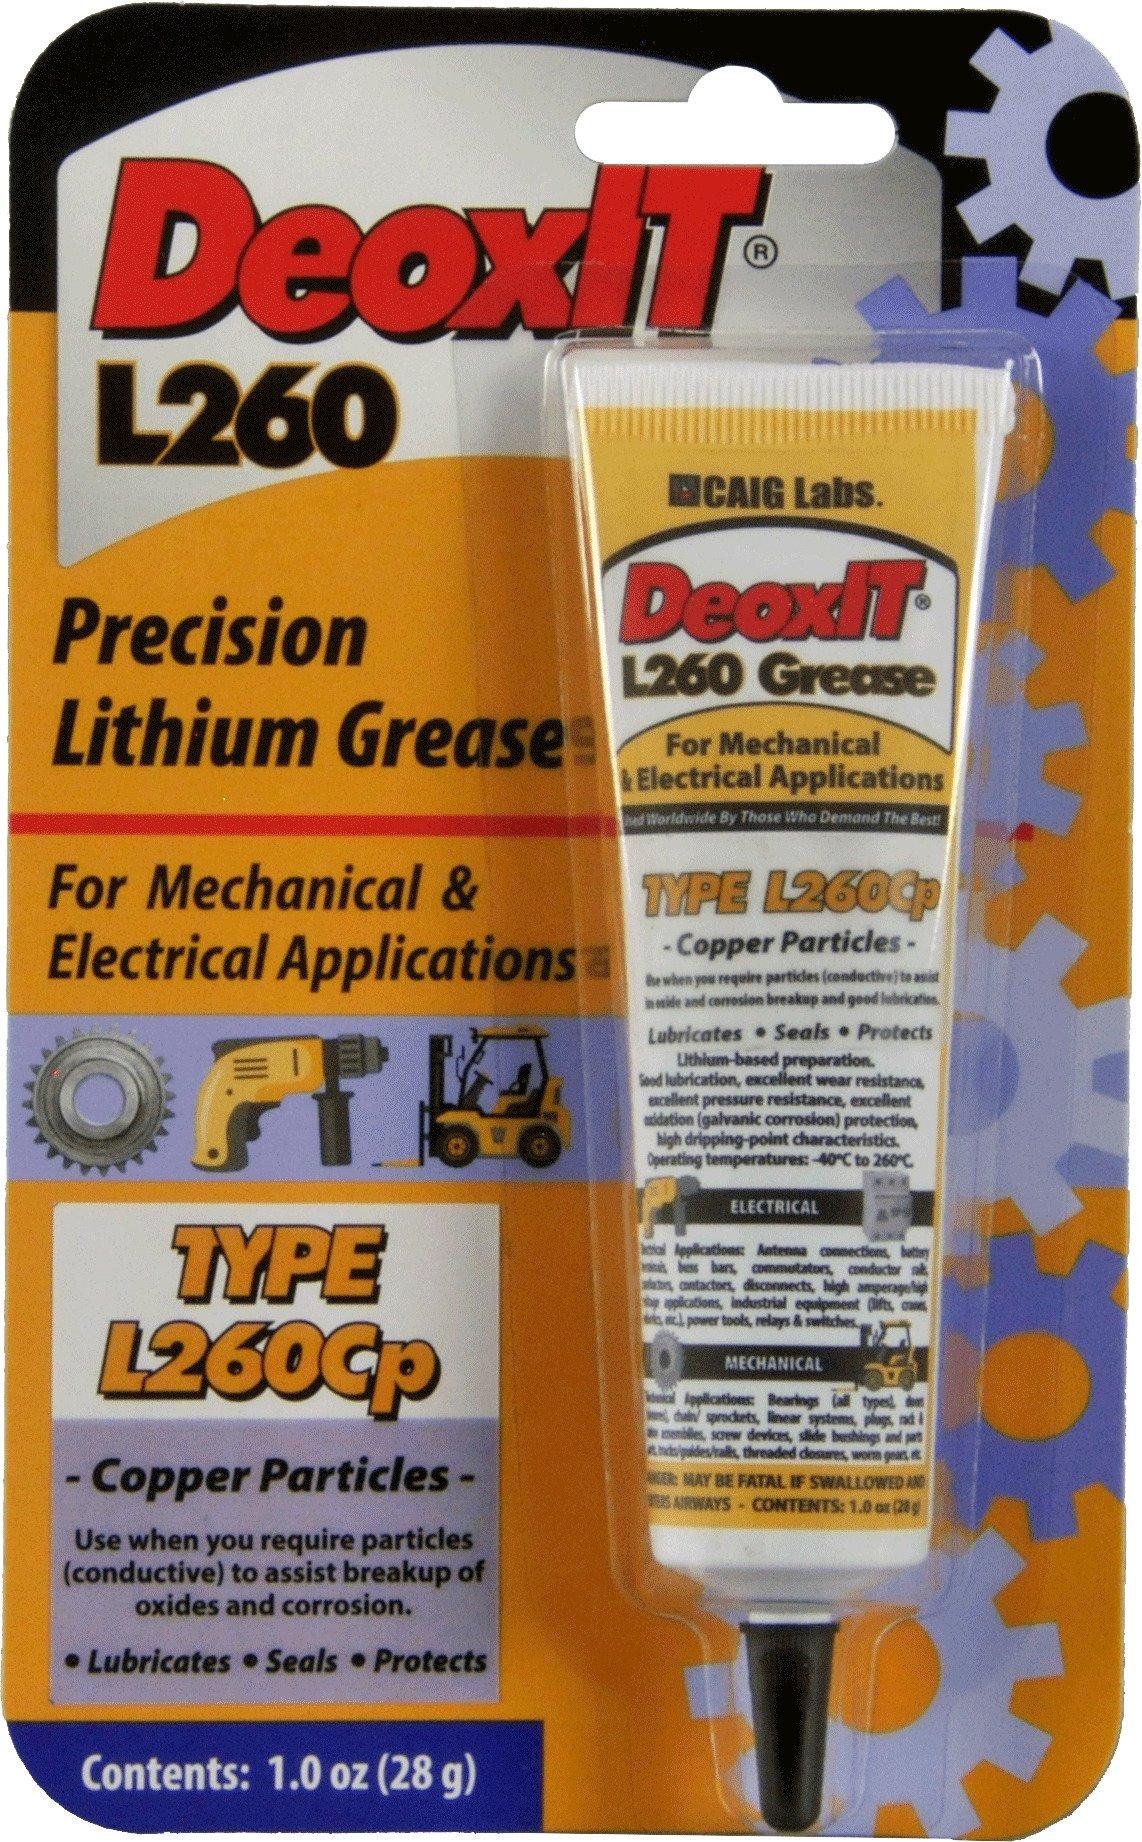 DeoxIT L260 Grease L260Cp, Tube copper particles 28 g - L260-C1 by CAIG Laboratories (Image #1)